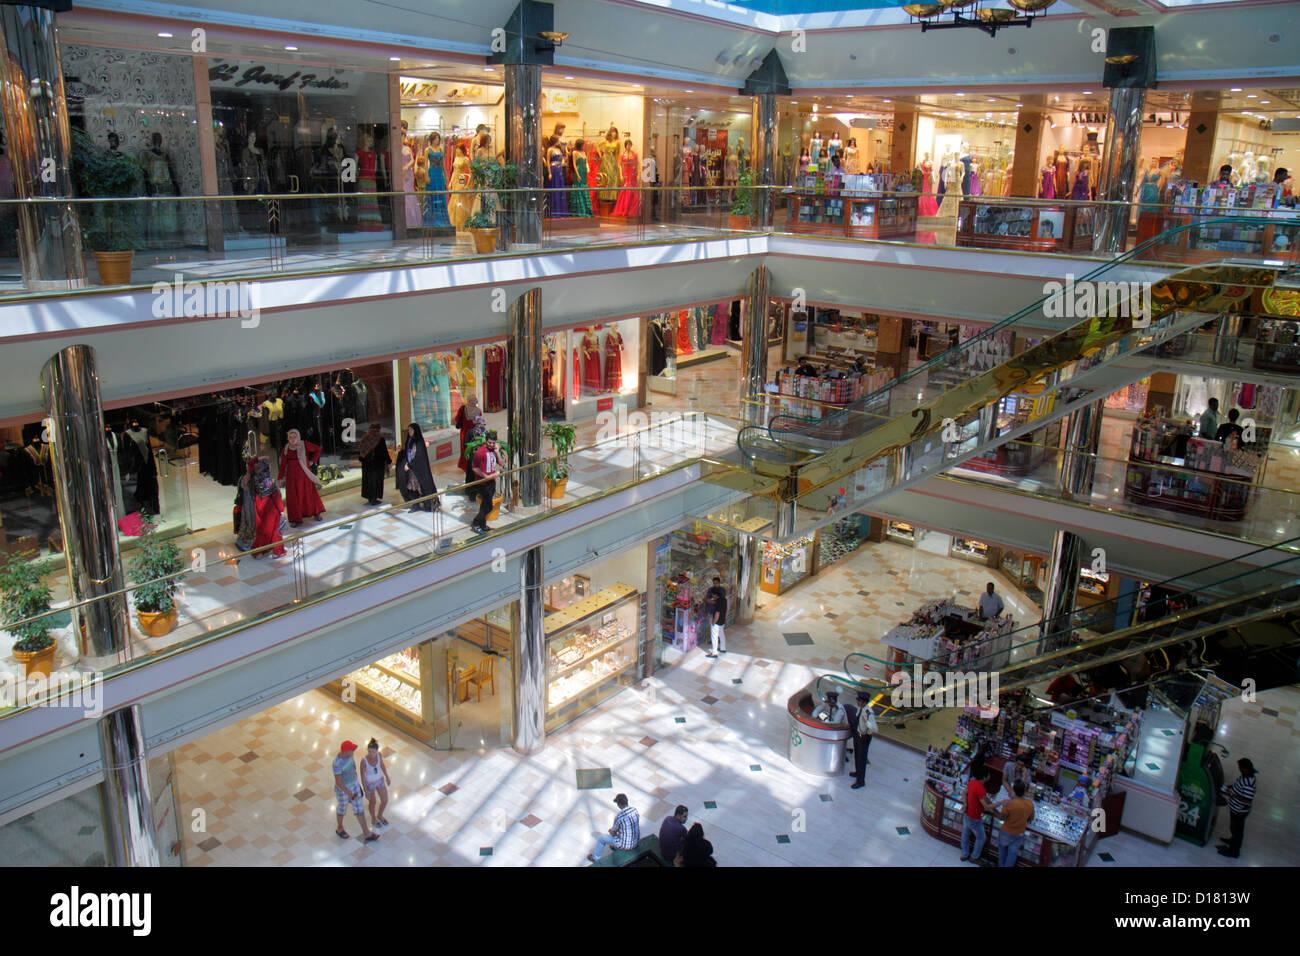 Dubai UAE United Arab Emirates U.A.E. Middle East Deira Murshid Bazar bazaar shopping Naif Souq mall stores levels - Stock Image